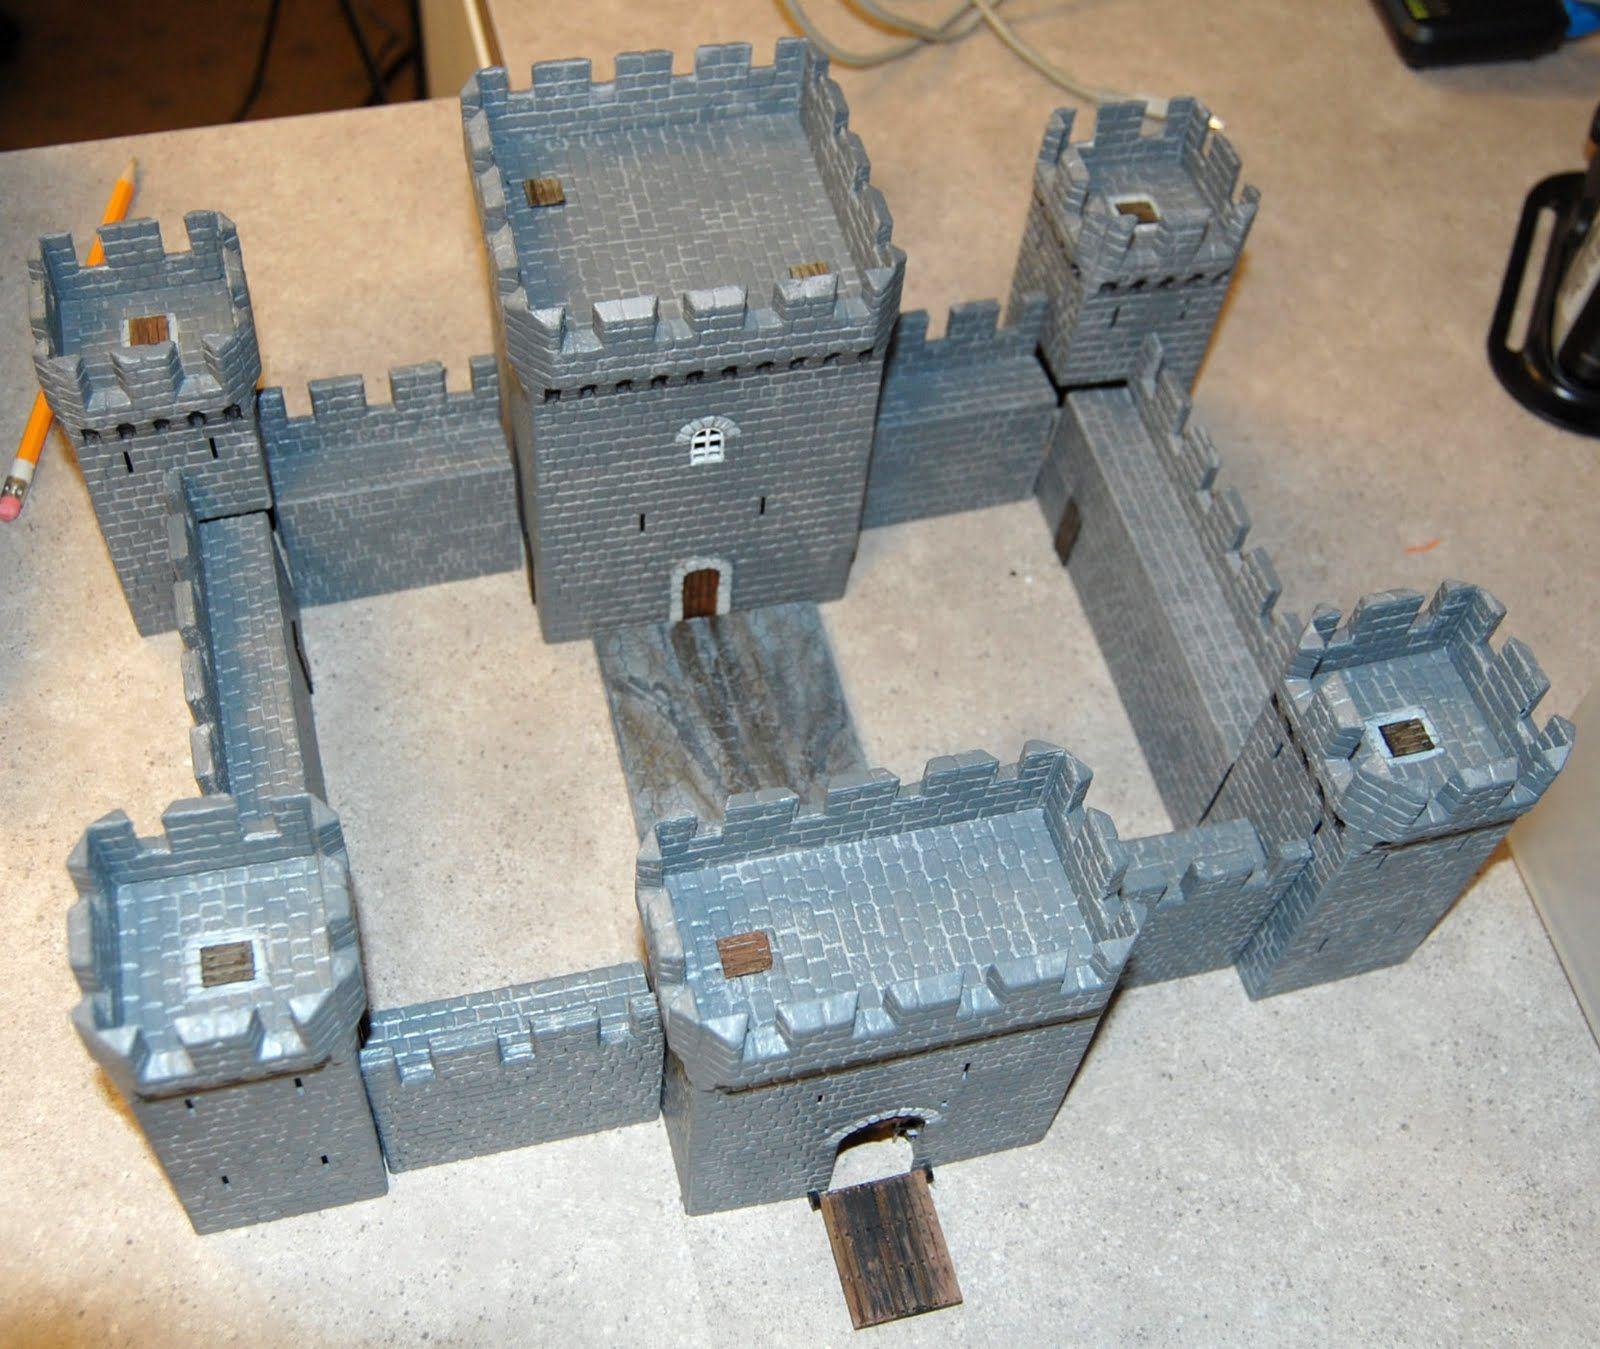 styrofoam+sheet+projects | two stone castles - part 2. | styrofoam